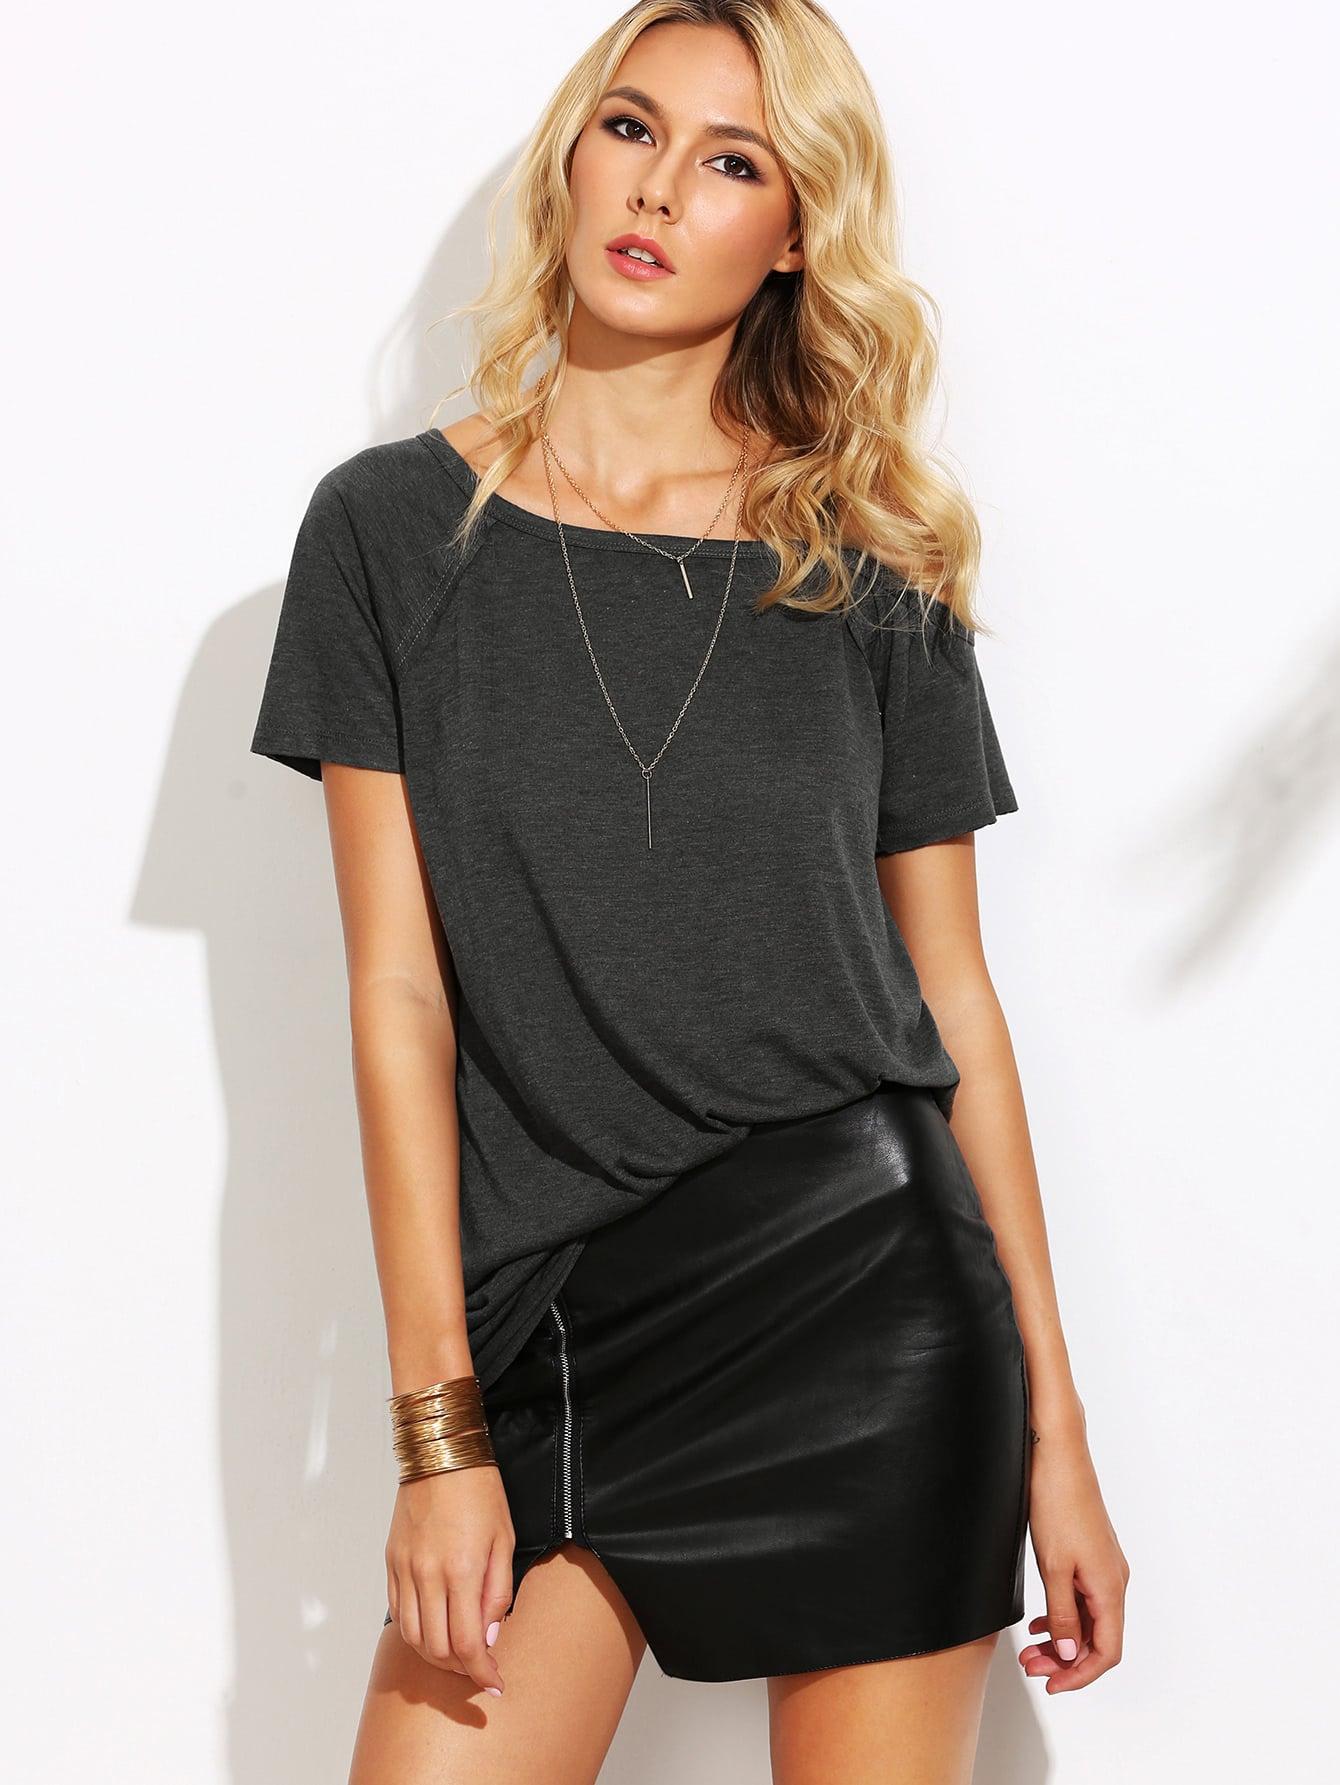 Heather Grey Asymmetric Cold Shoulder T-shirt